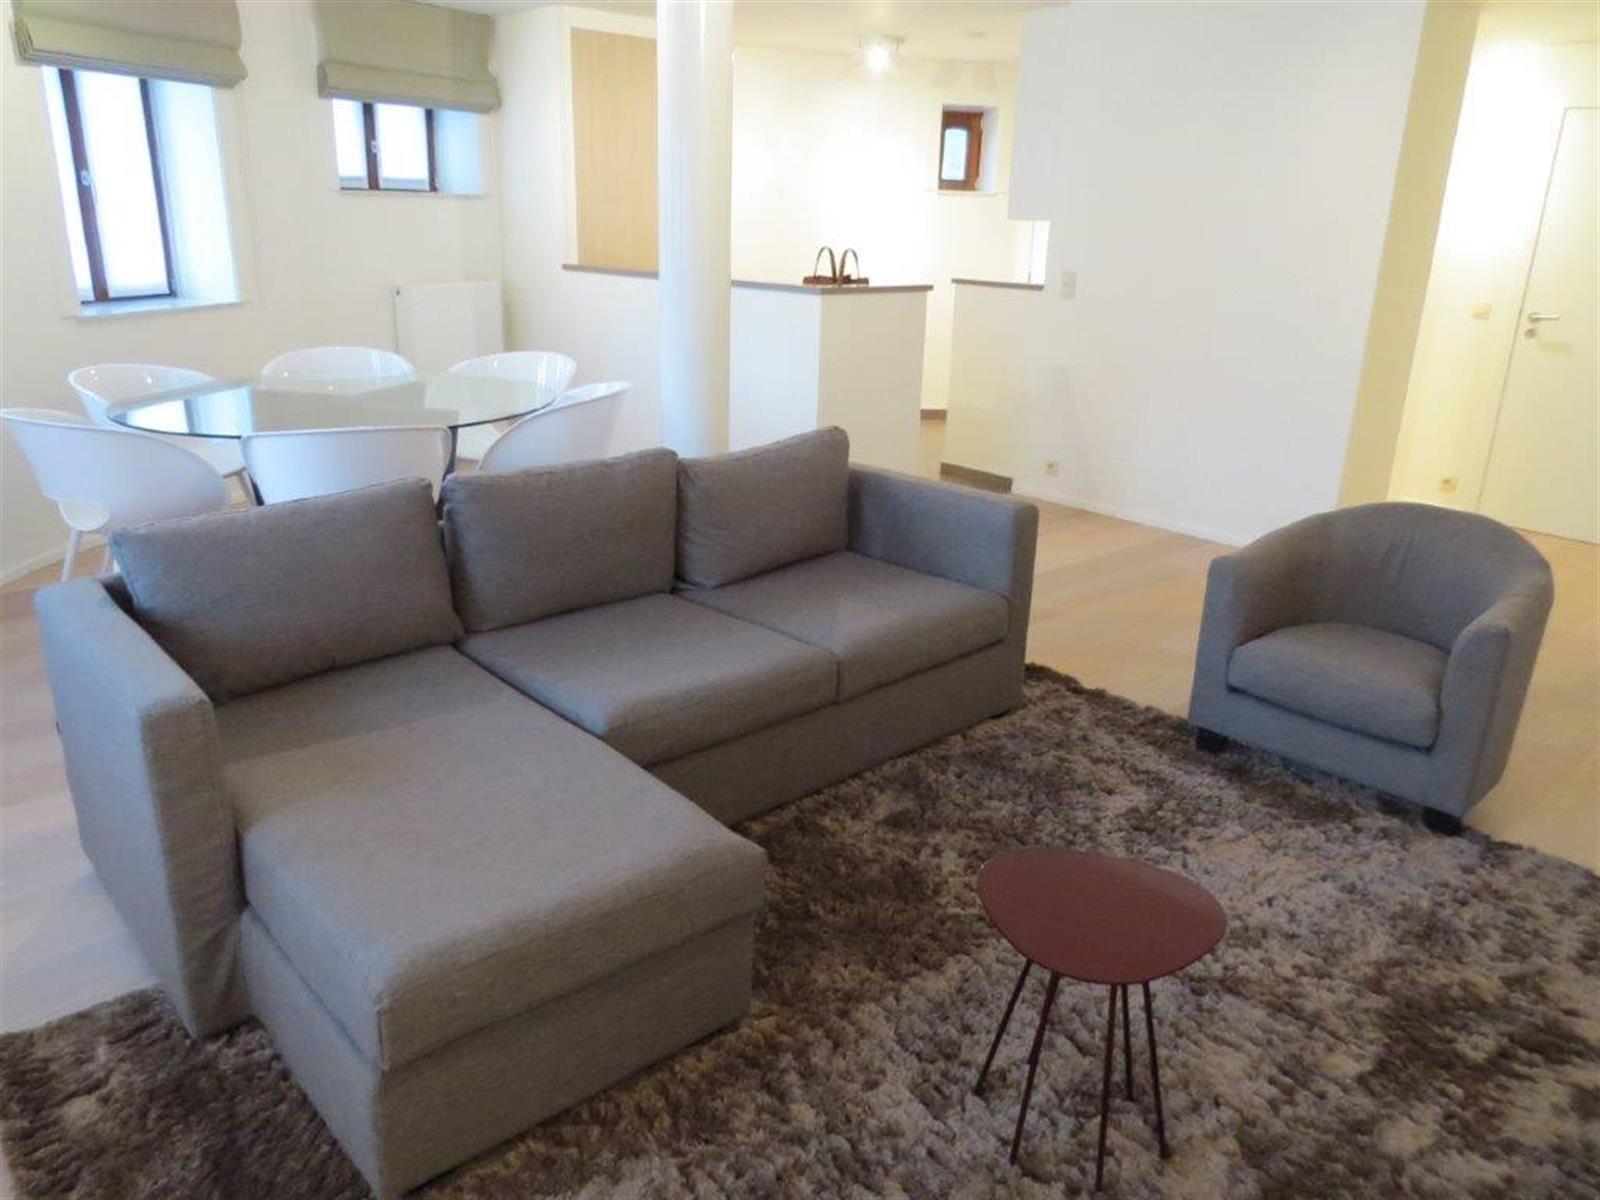 Appartement - Auderghem - #3950122-1